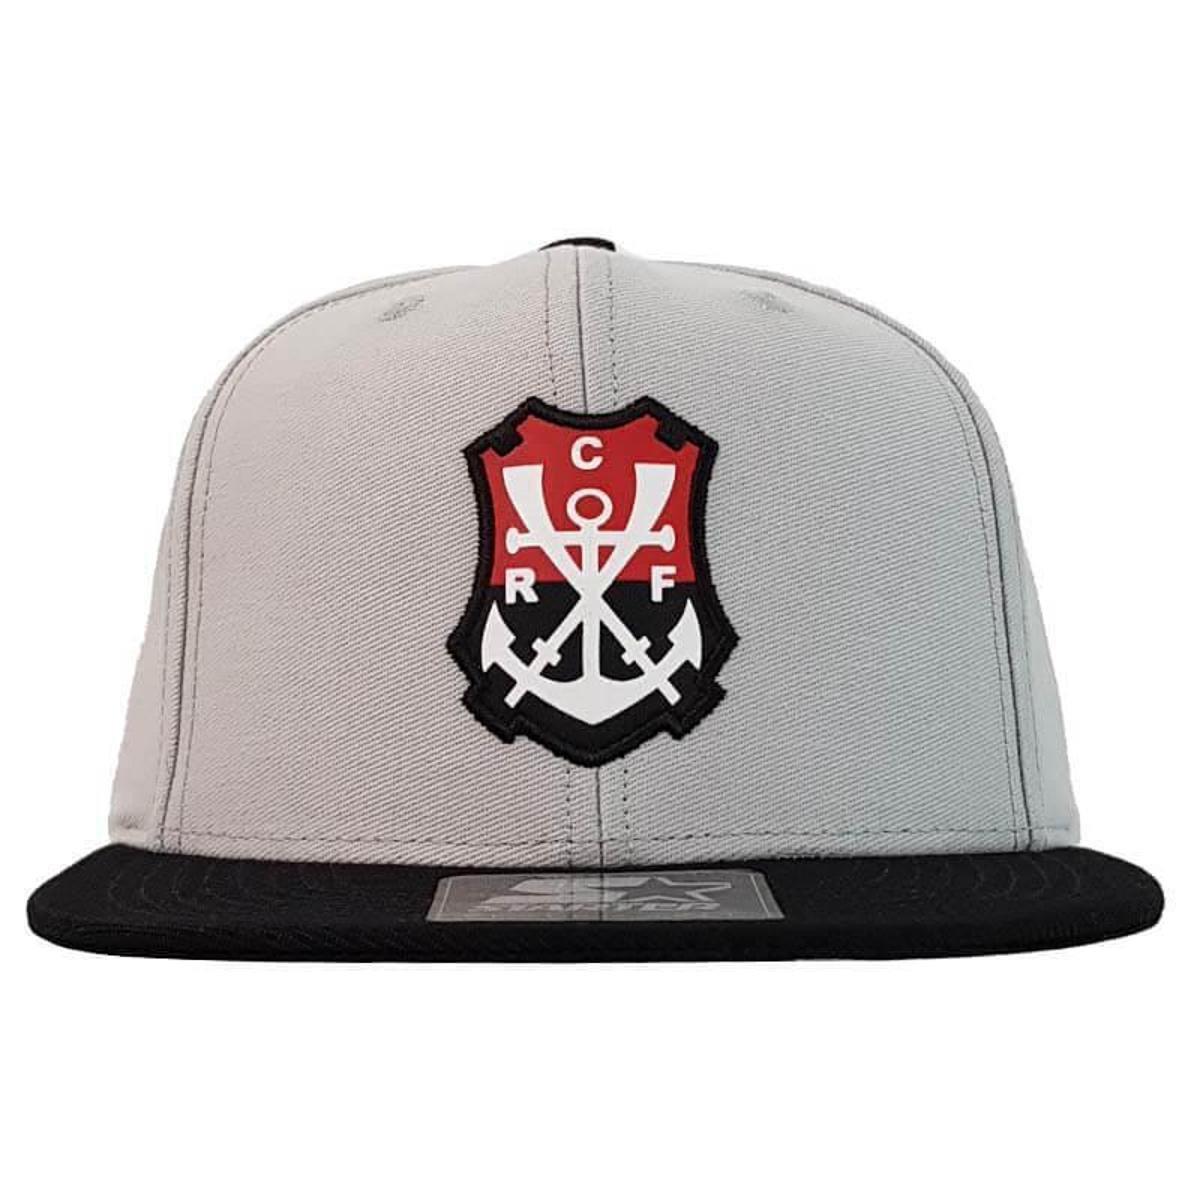 68734eac4cb5c Boné Flamengo 6G Logo Regata Starter - Cinza e Preto - Compre Agora ...